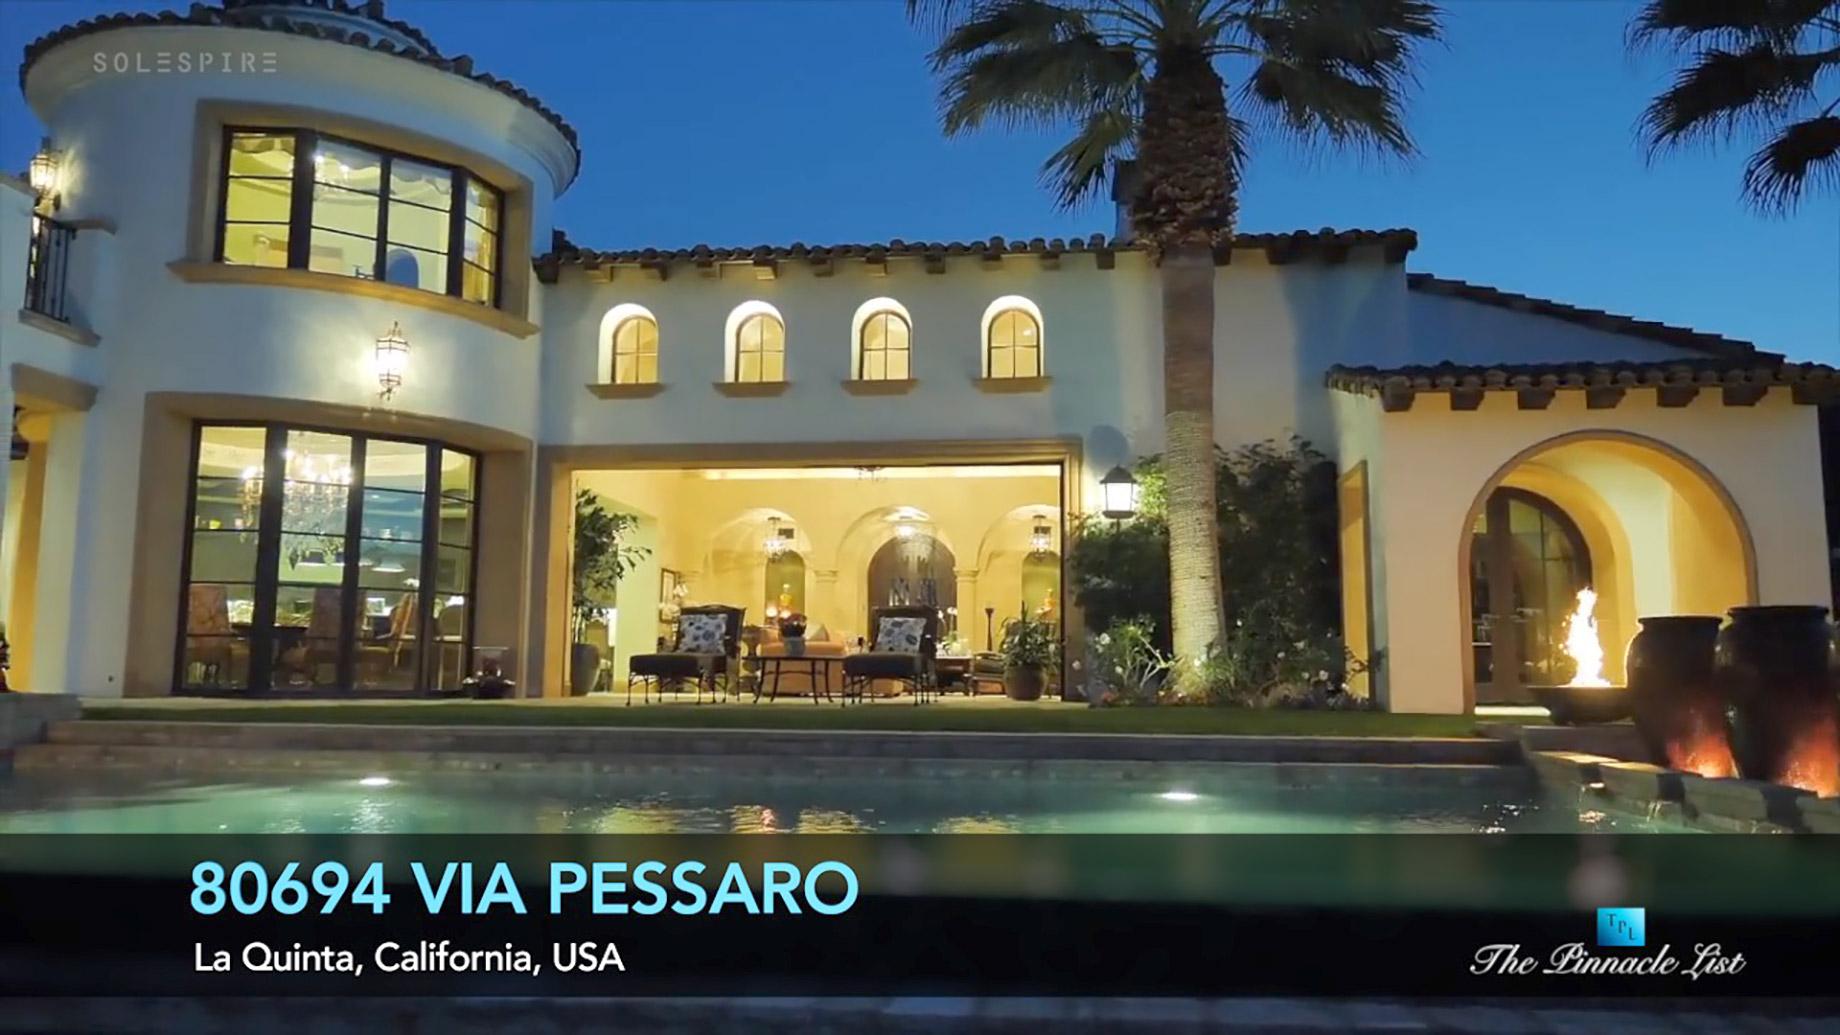 80694 Via Pessaro, La Quinta, CA, USA - Luxury Real Estate - Video